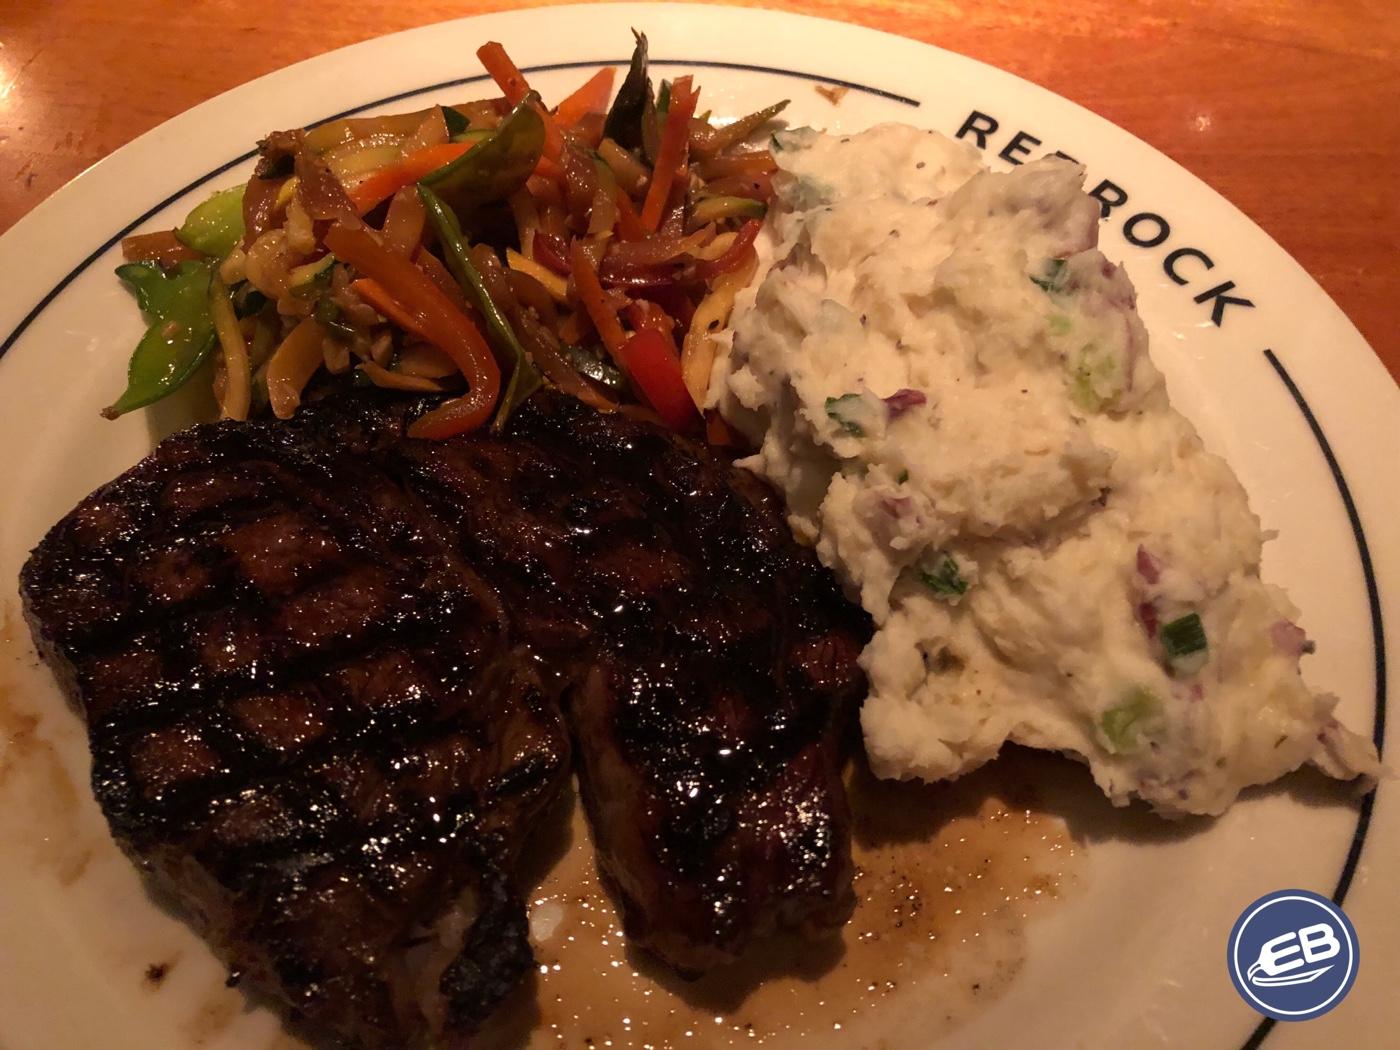 Redrock Canyon Grill